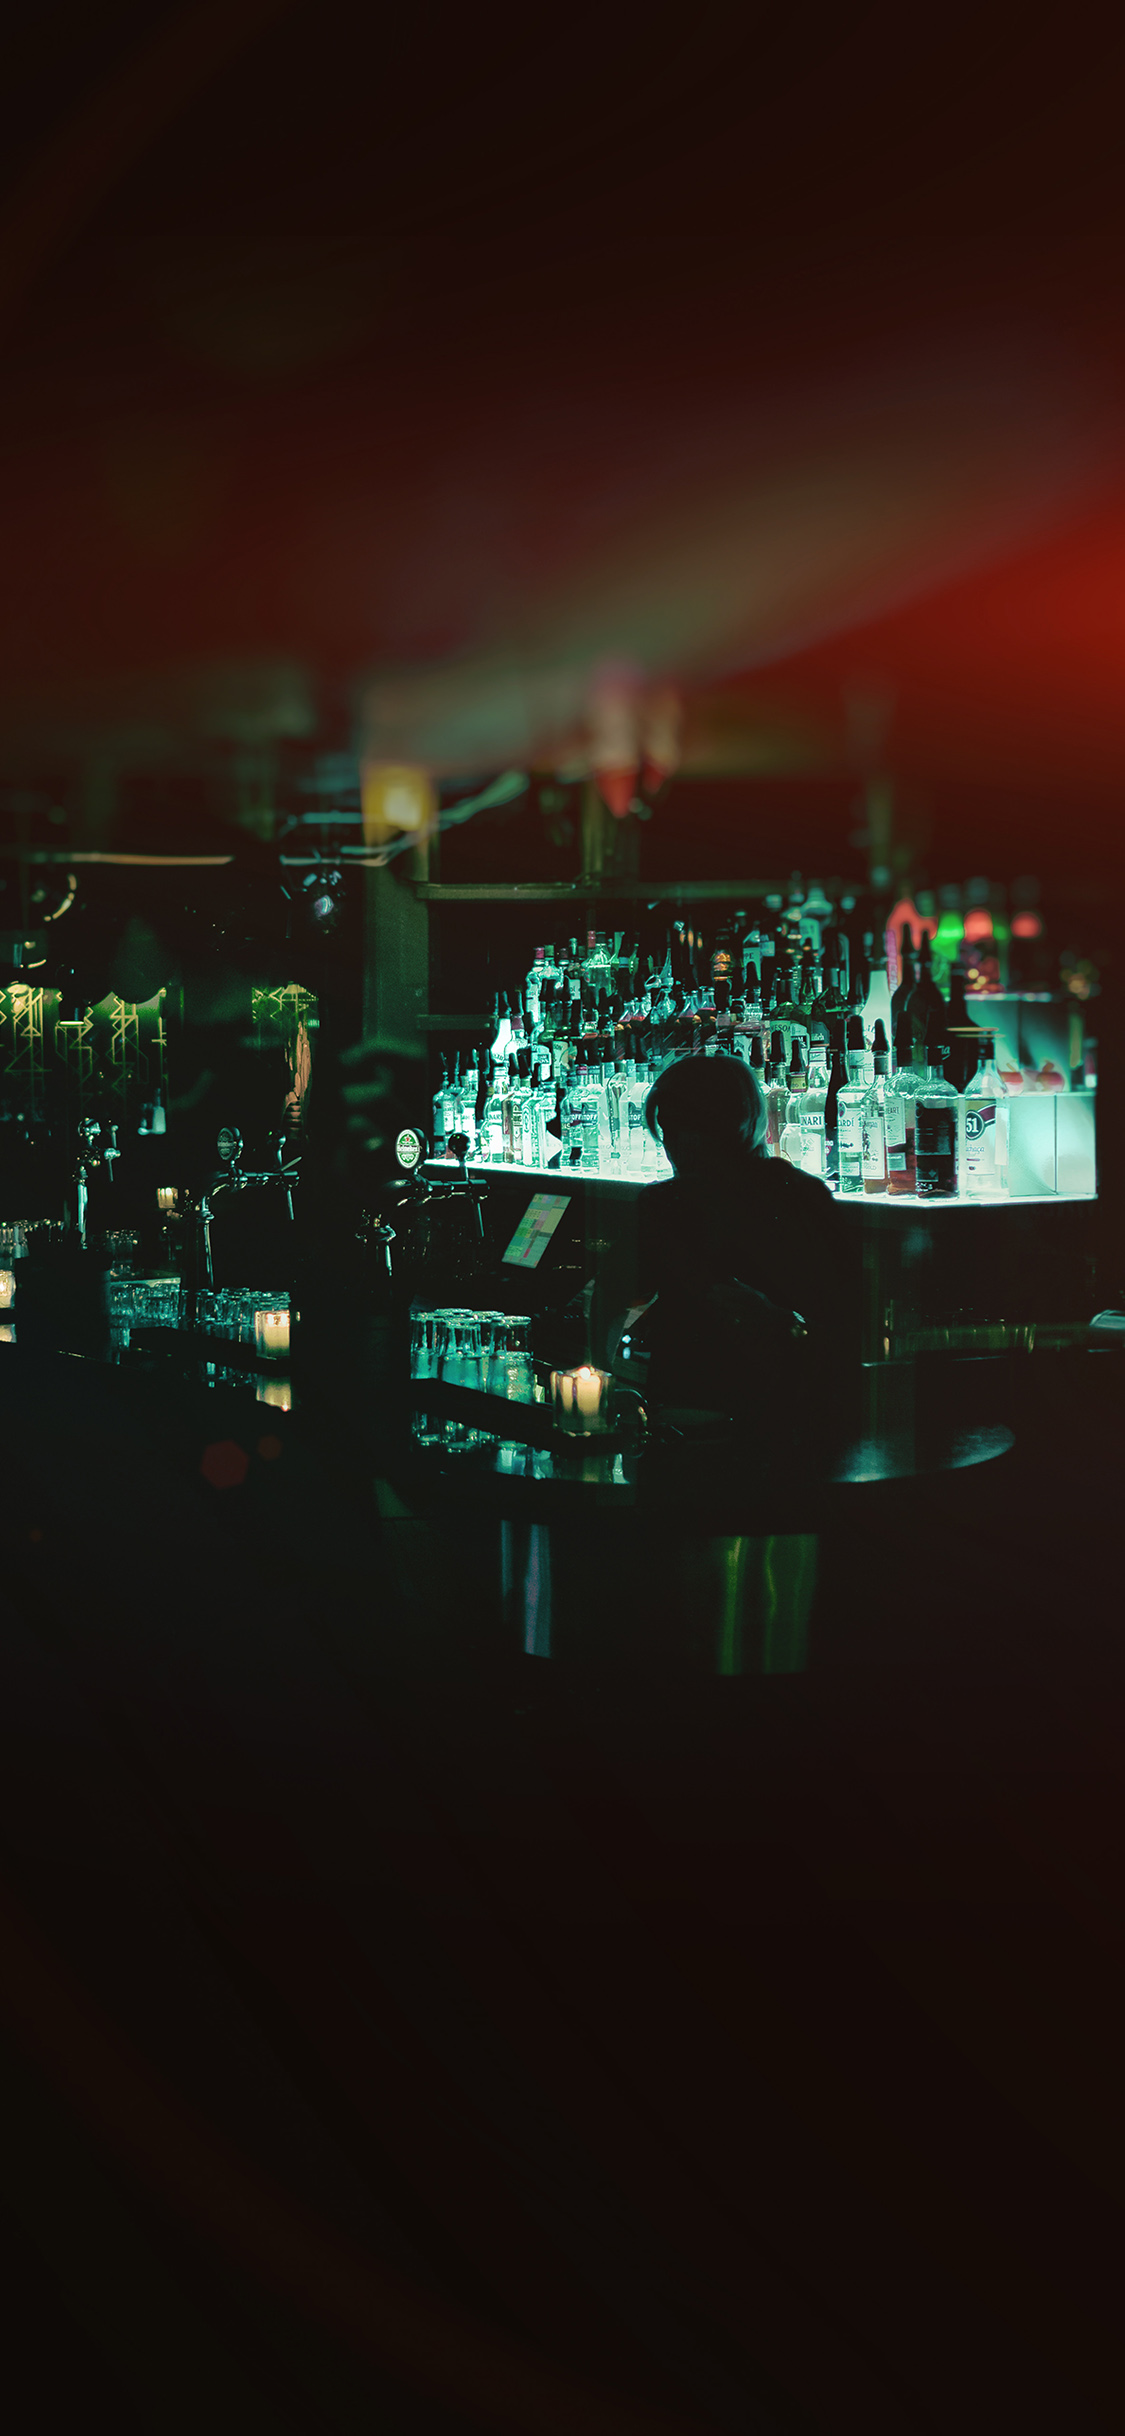 iPhonexpapers.com-Apple-iPhone-wallpaper-az07-night-judebar-dark-illustration-art-flare